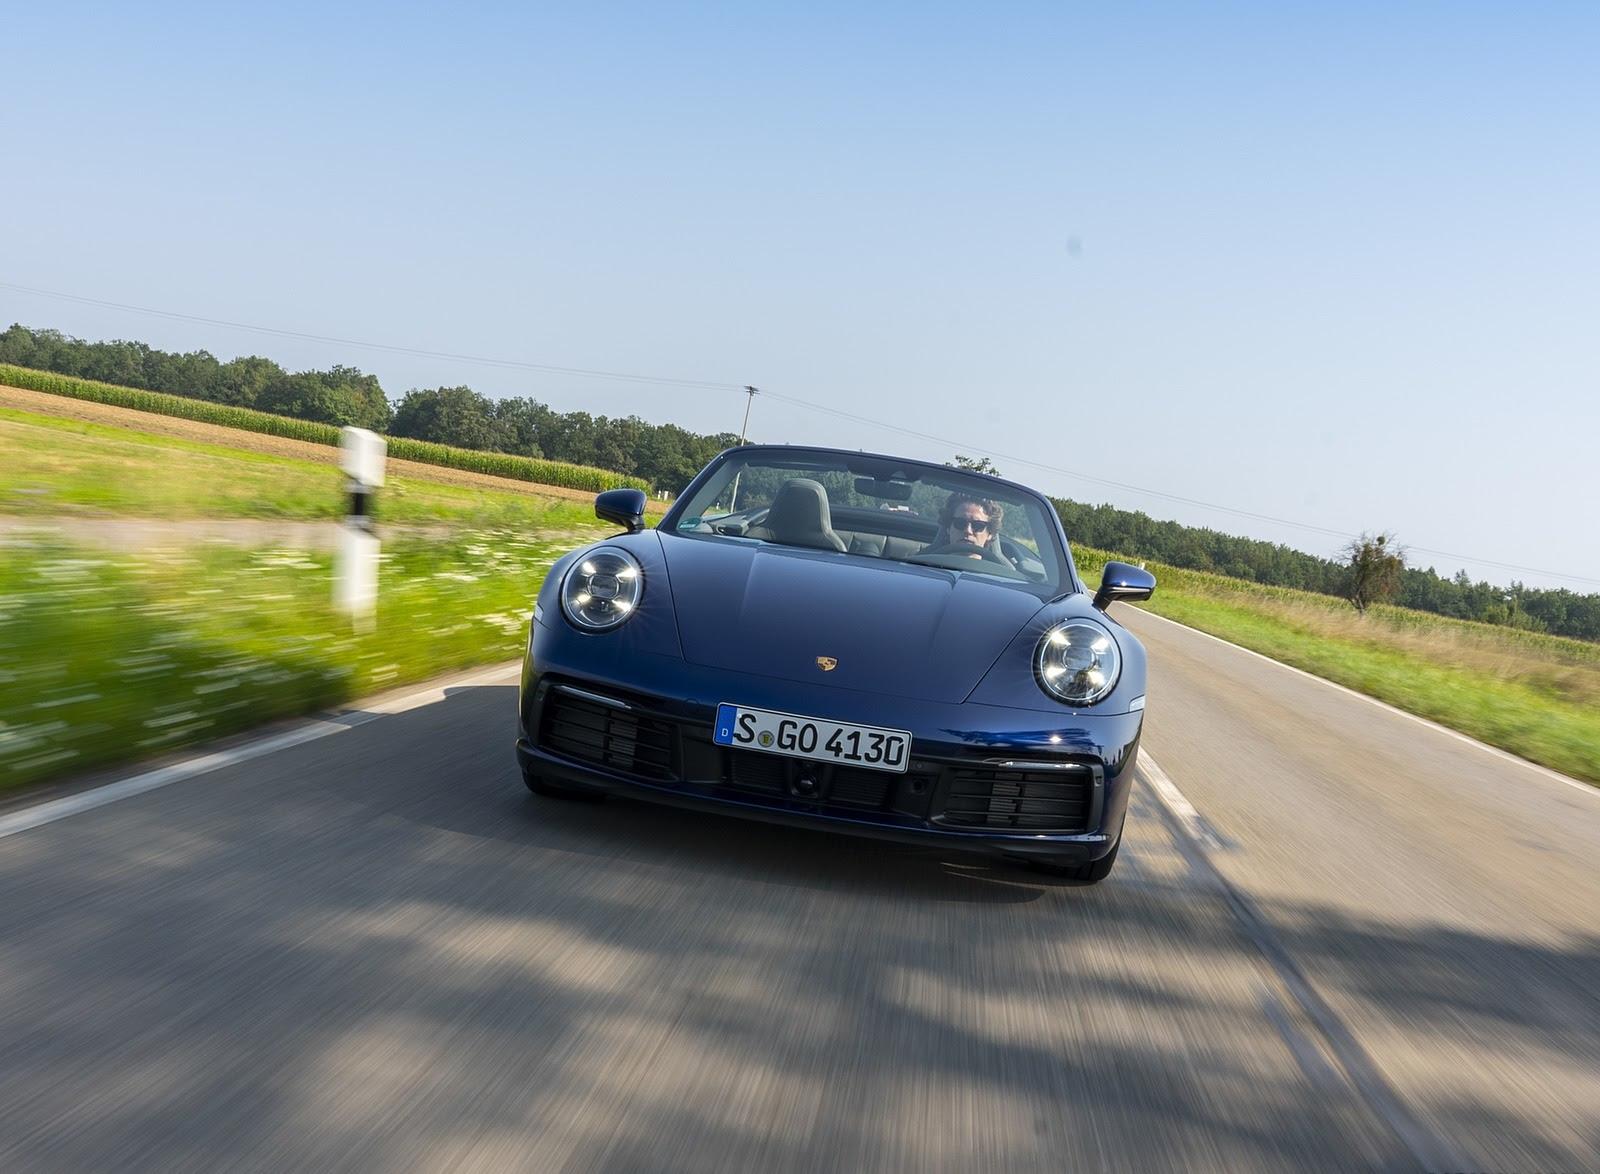 2020 Porsche 911 Carrera Cabriolet Color Gentian Blue Metallic Images, Photos, Reviews